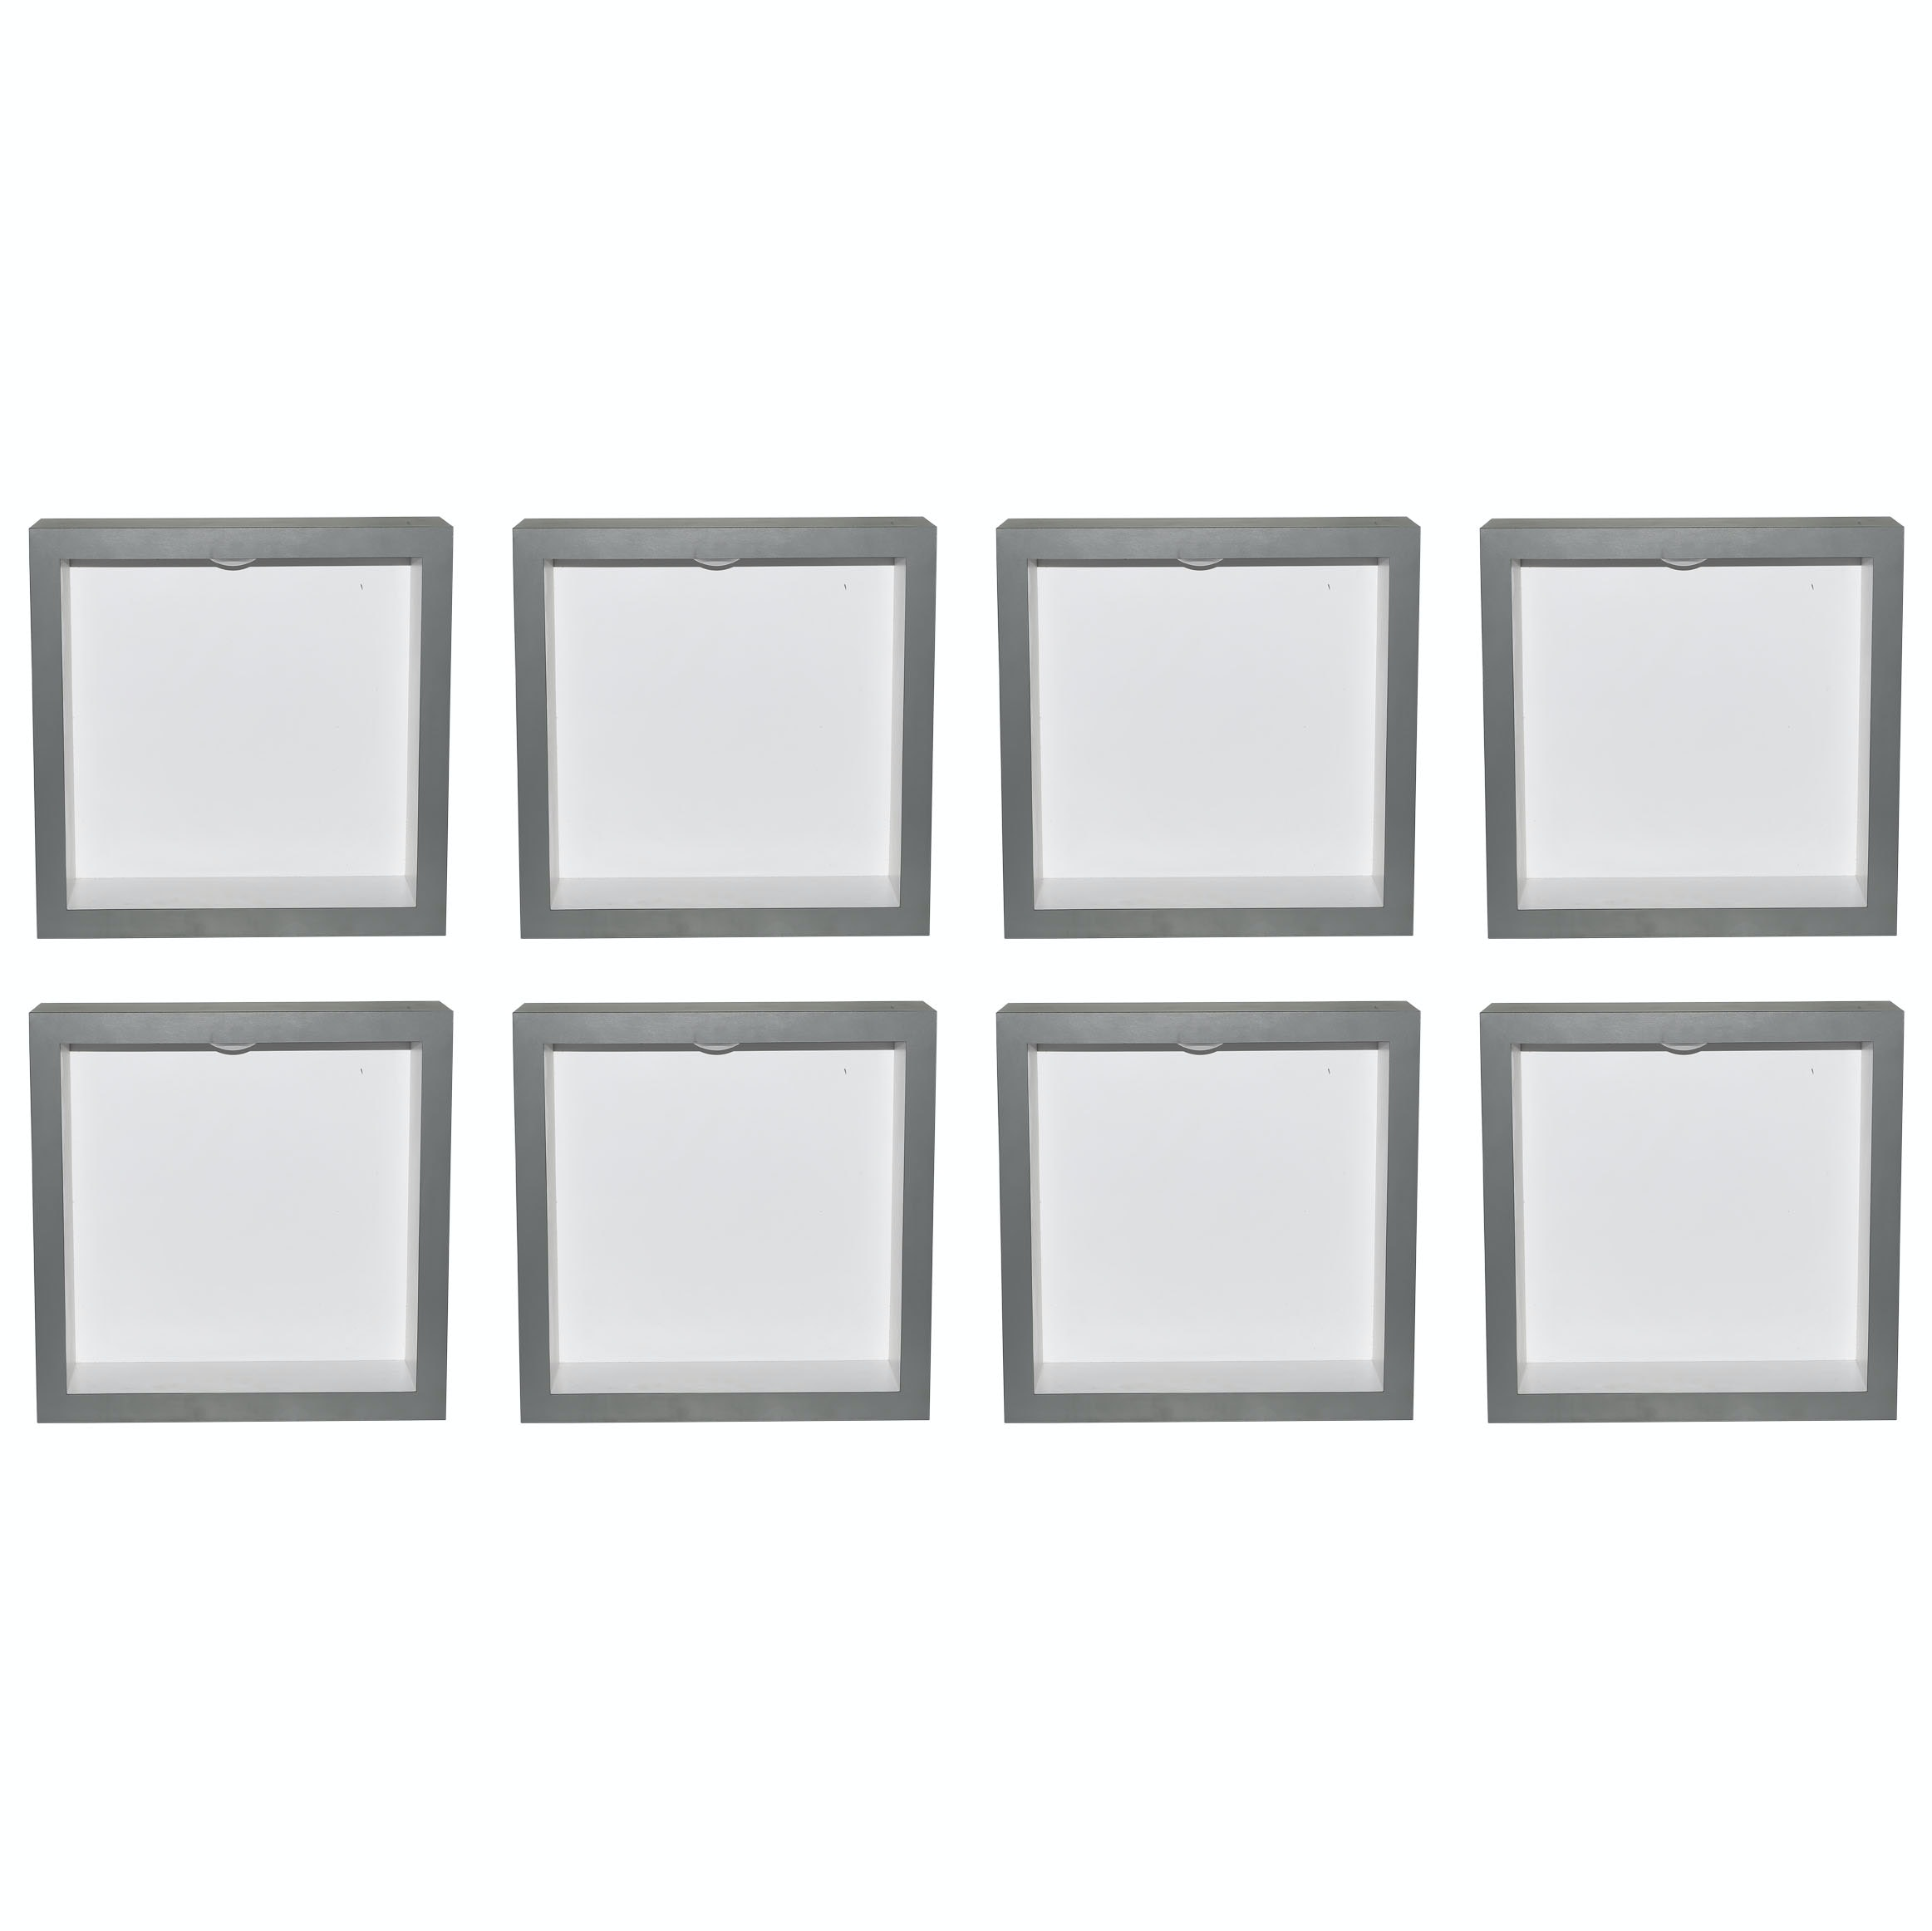 Gray Laminate Display Cubes